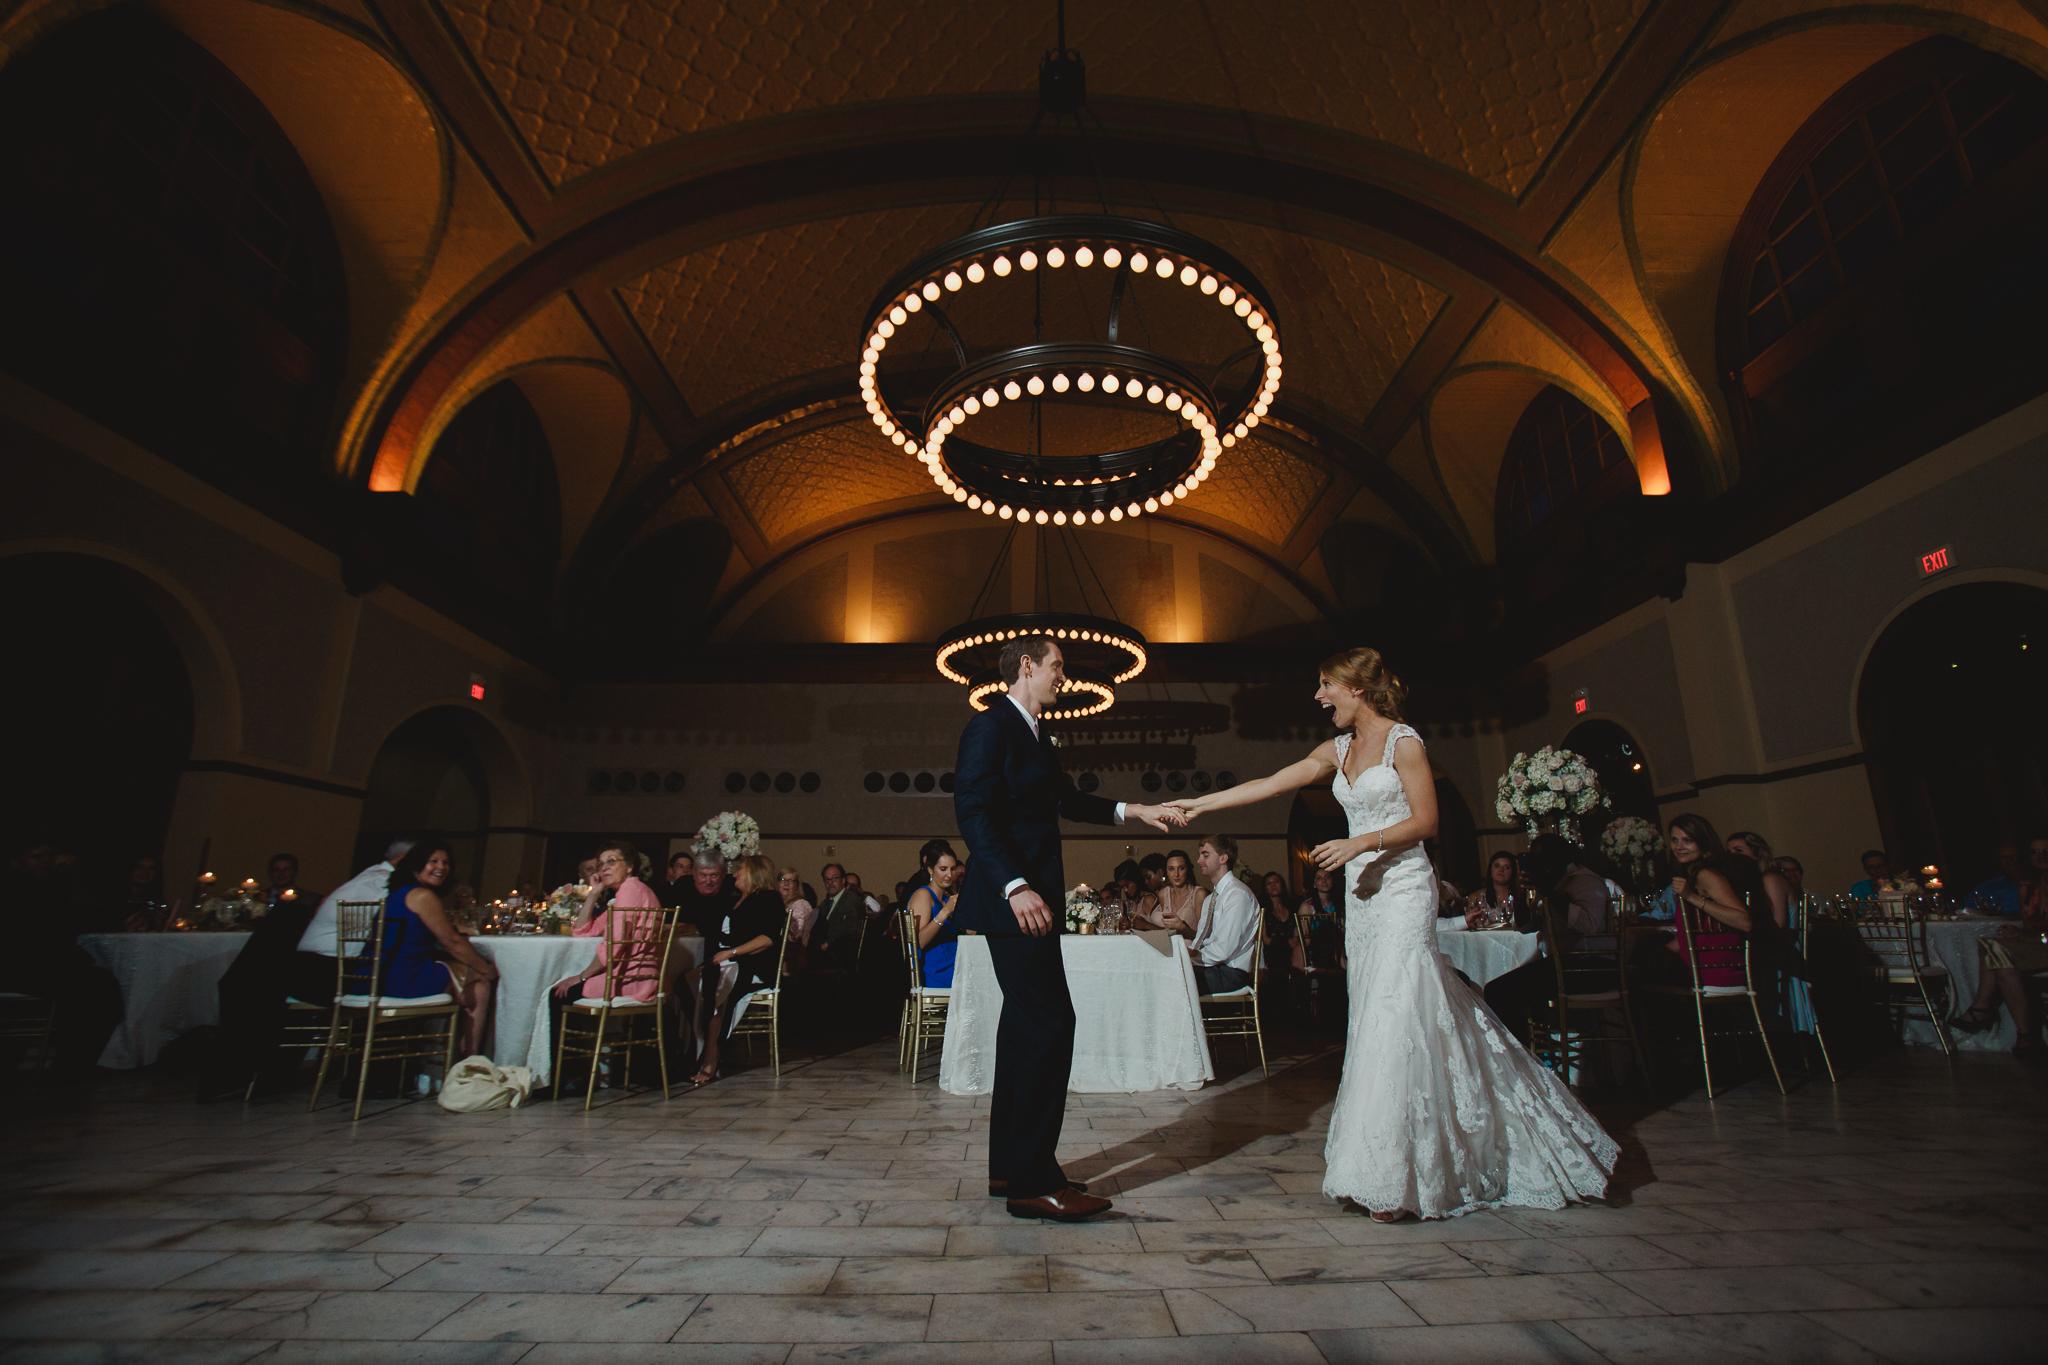 Michael and Kelly - the ashton depot - wedding DFW - wedding photographer- elizalde photography (113 of 150).jpg